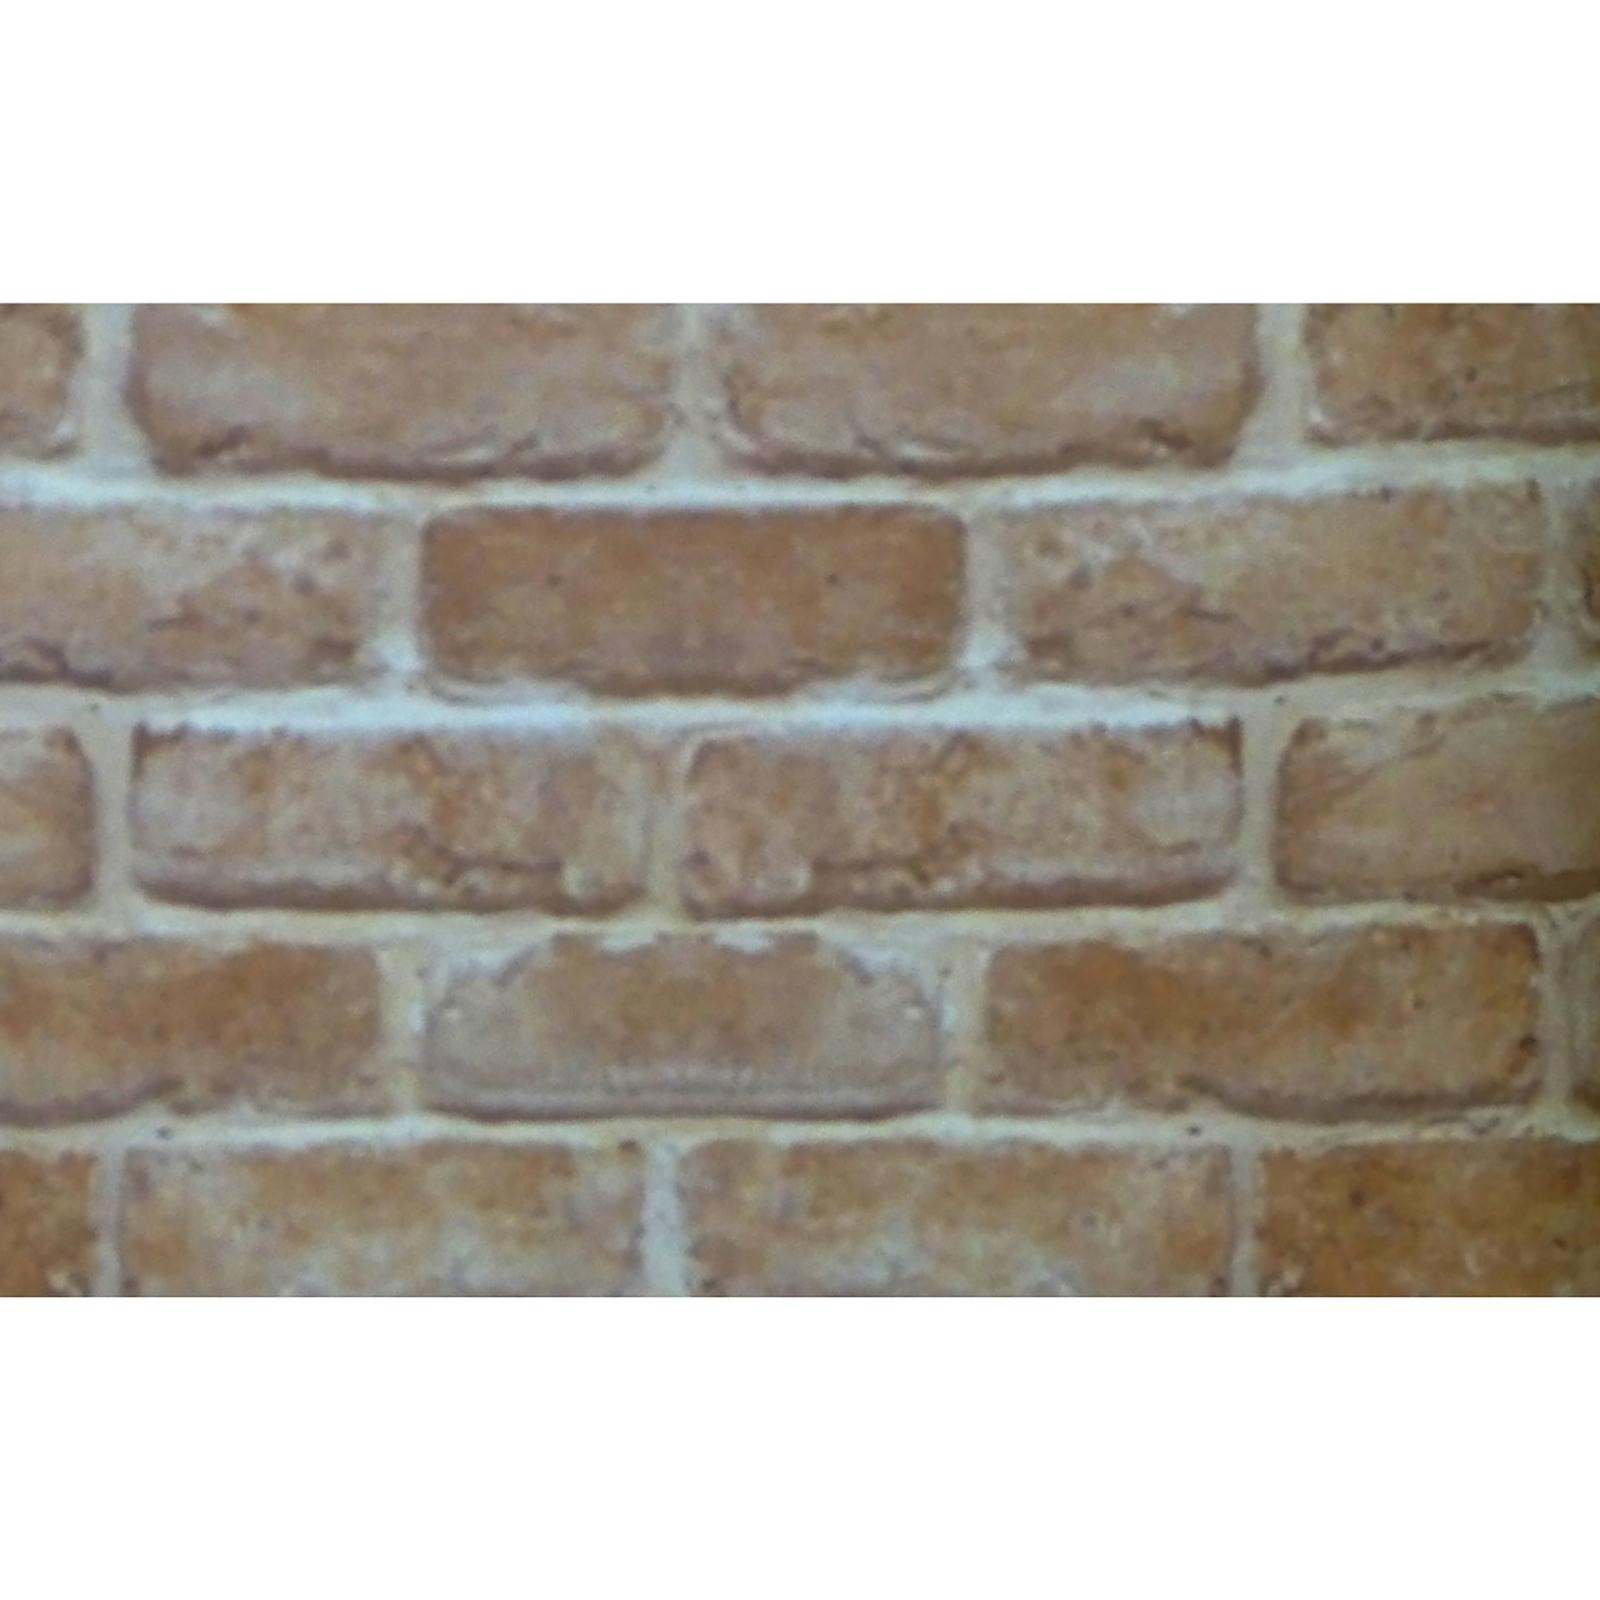 Wallpaper Borders Bunnings Fake Brick Wall Bunnings 430988 Hd Wallpaper Backgrounds Download